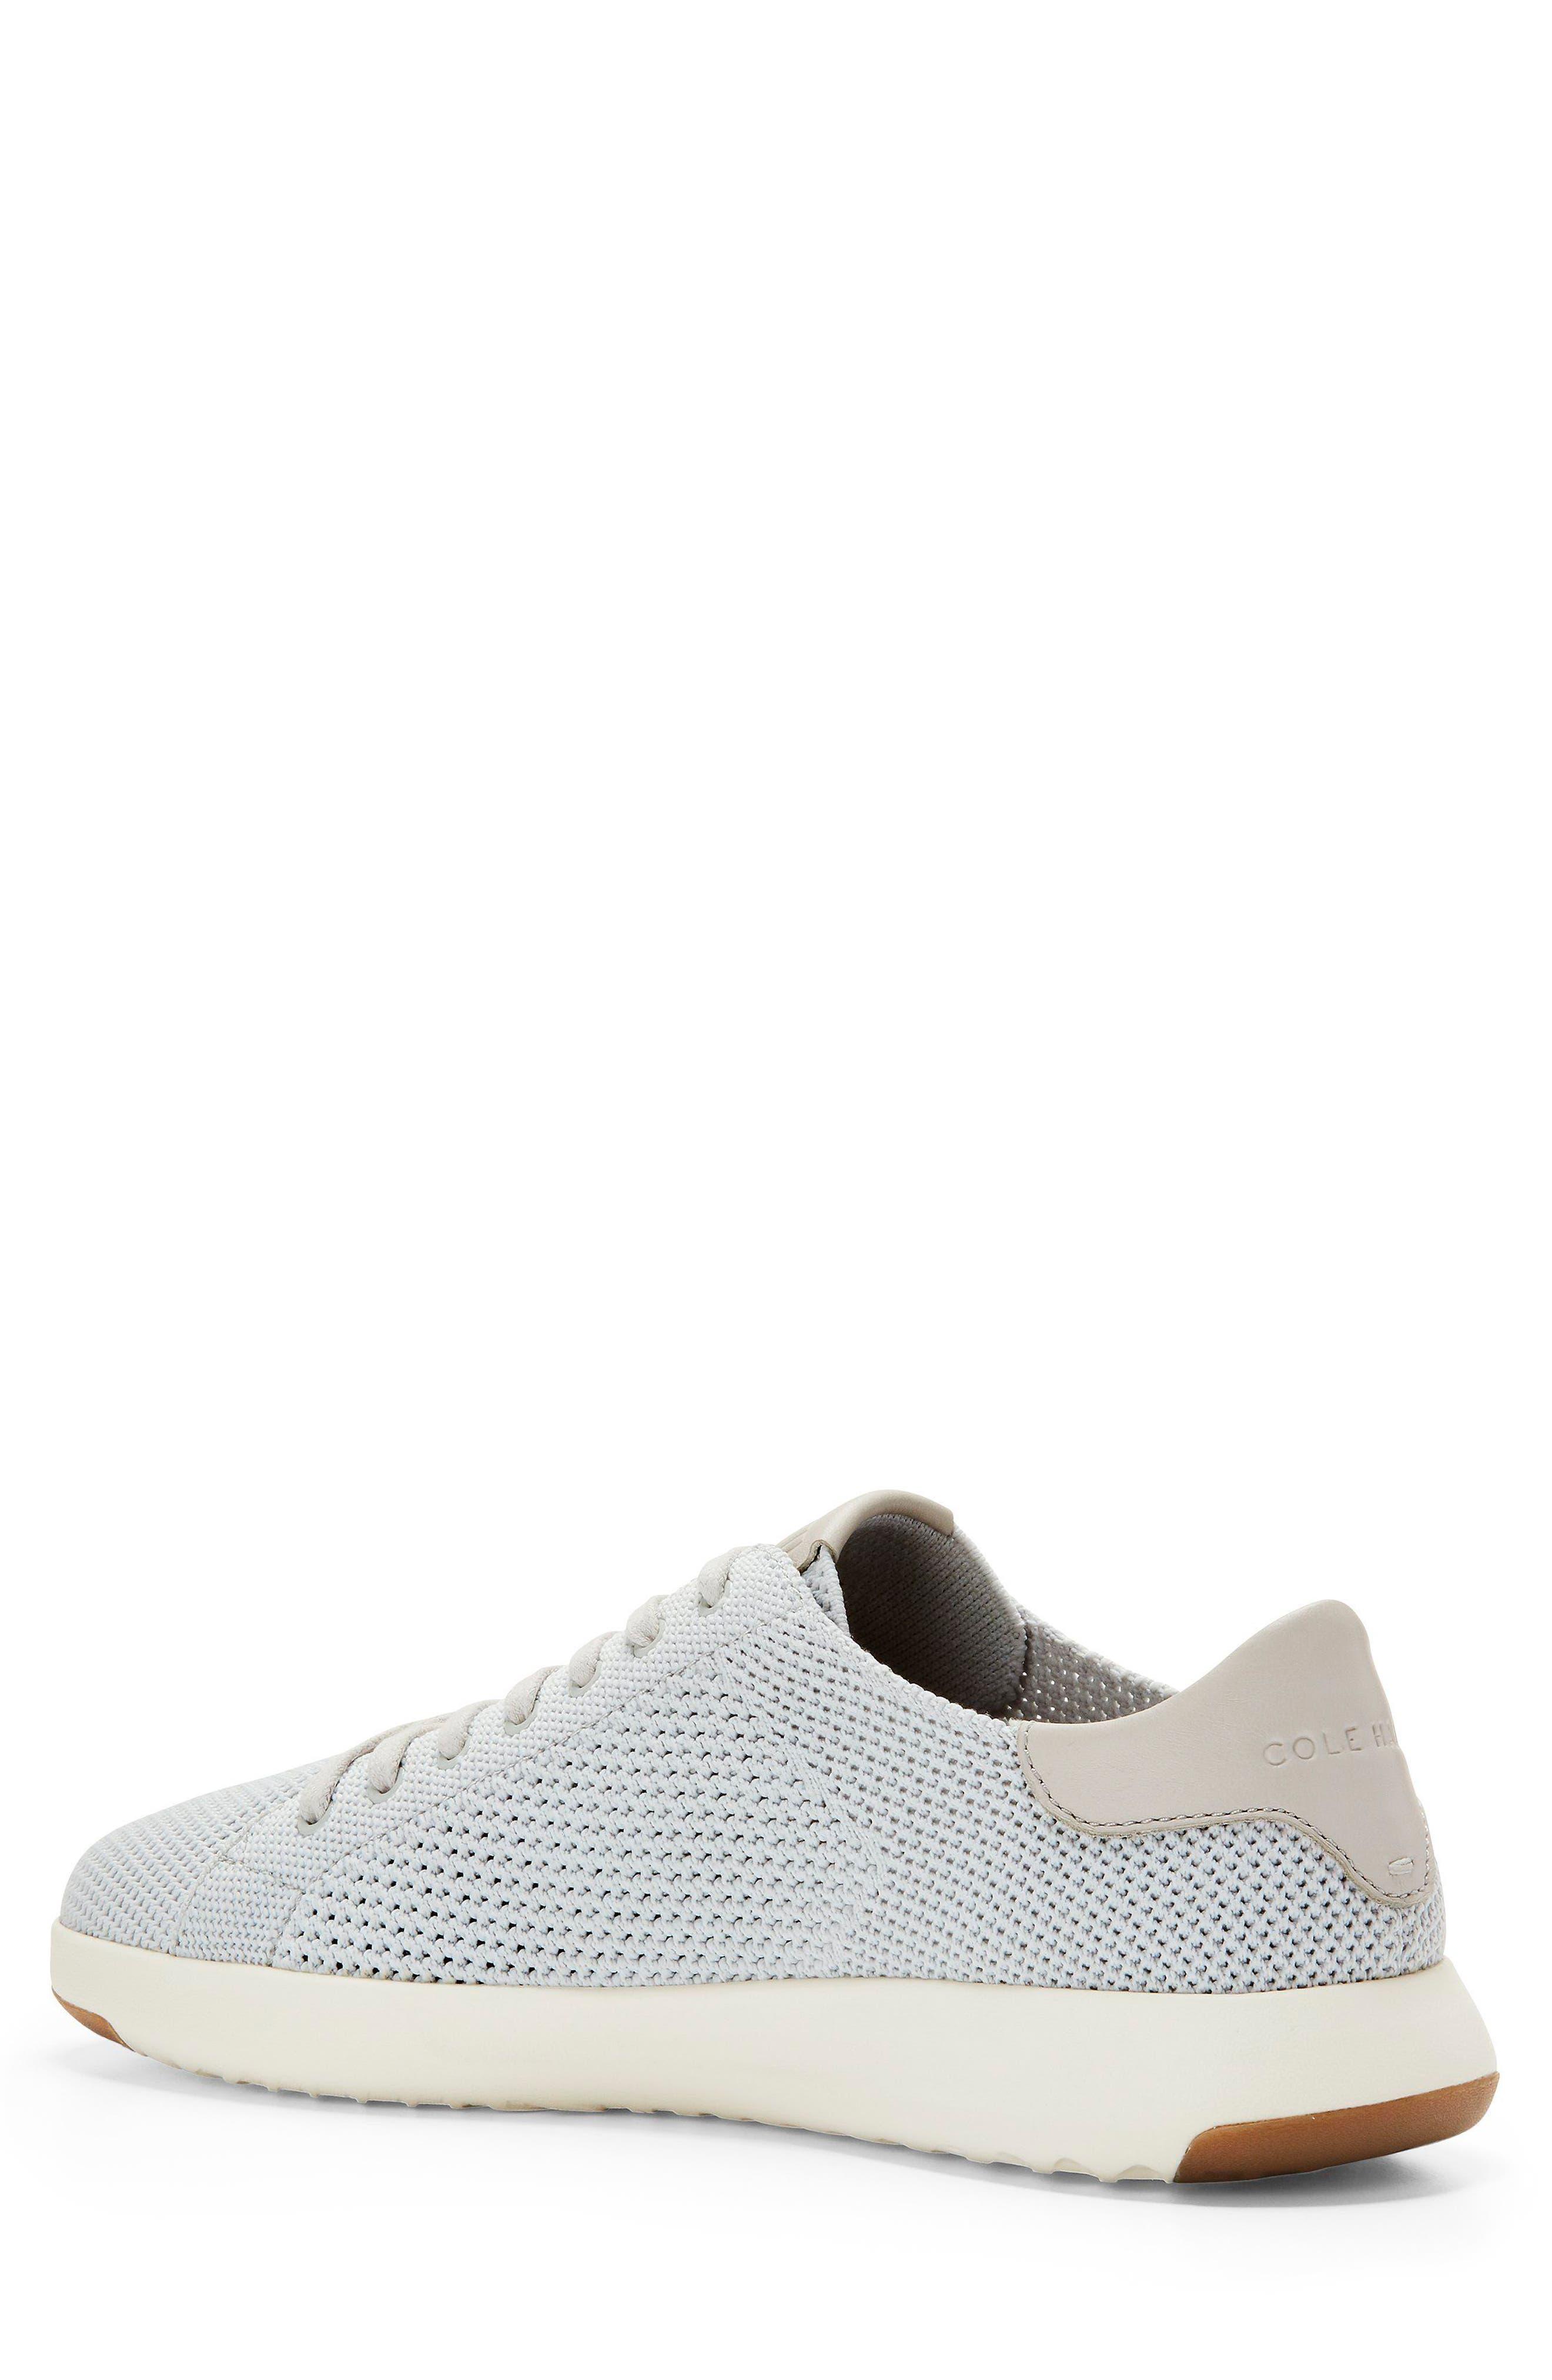 GrandPro Tennis Stitchlite Sneaker,                             Alternate thumbnail 2, color,                             Vapor Gray/ Optic White